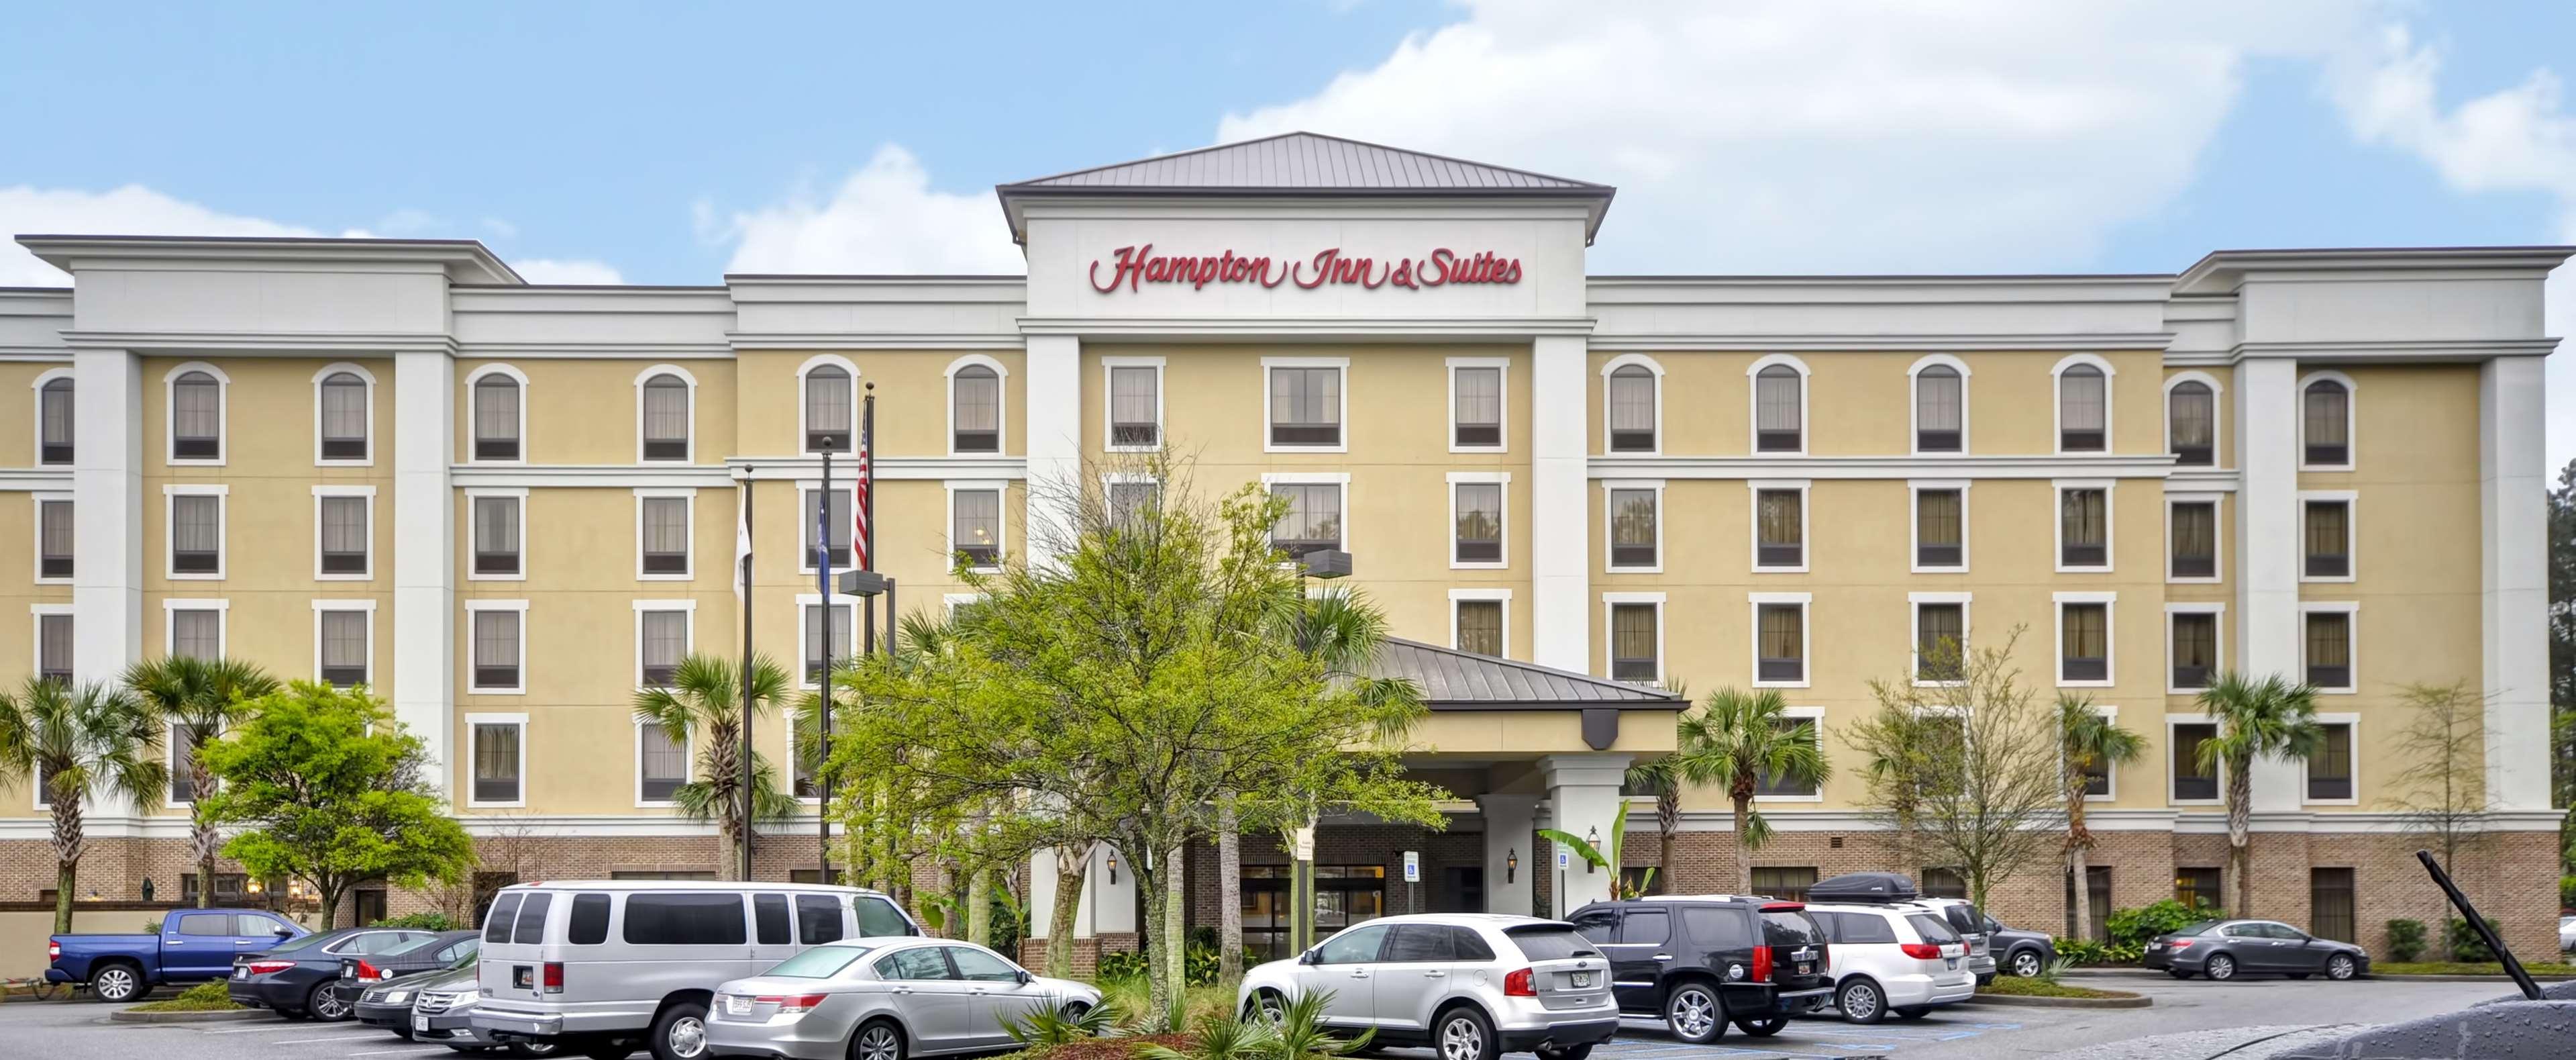 Hampton Inn & Suites North Charleston-University Blvd